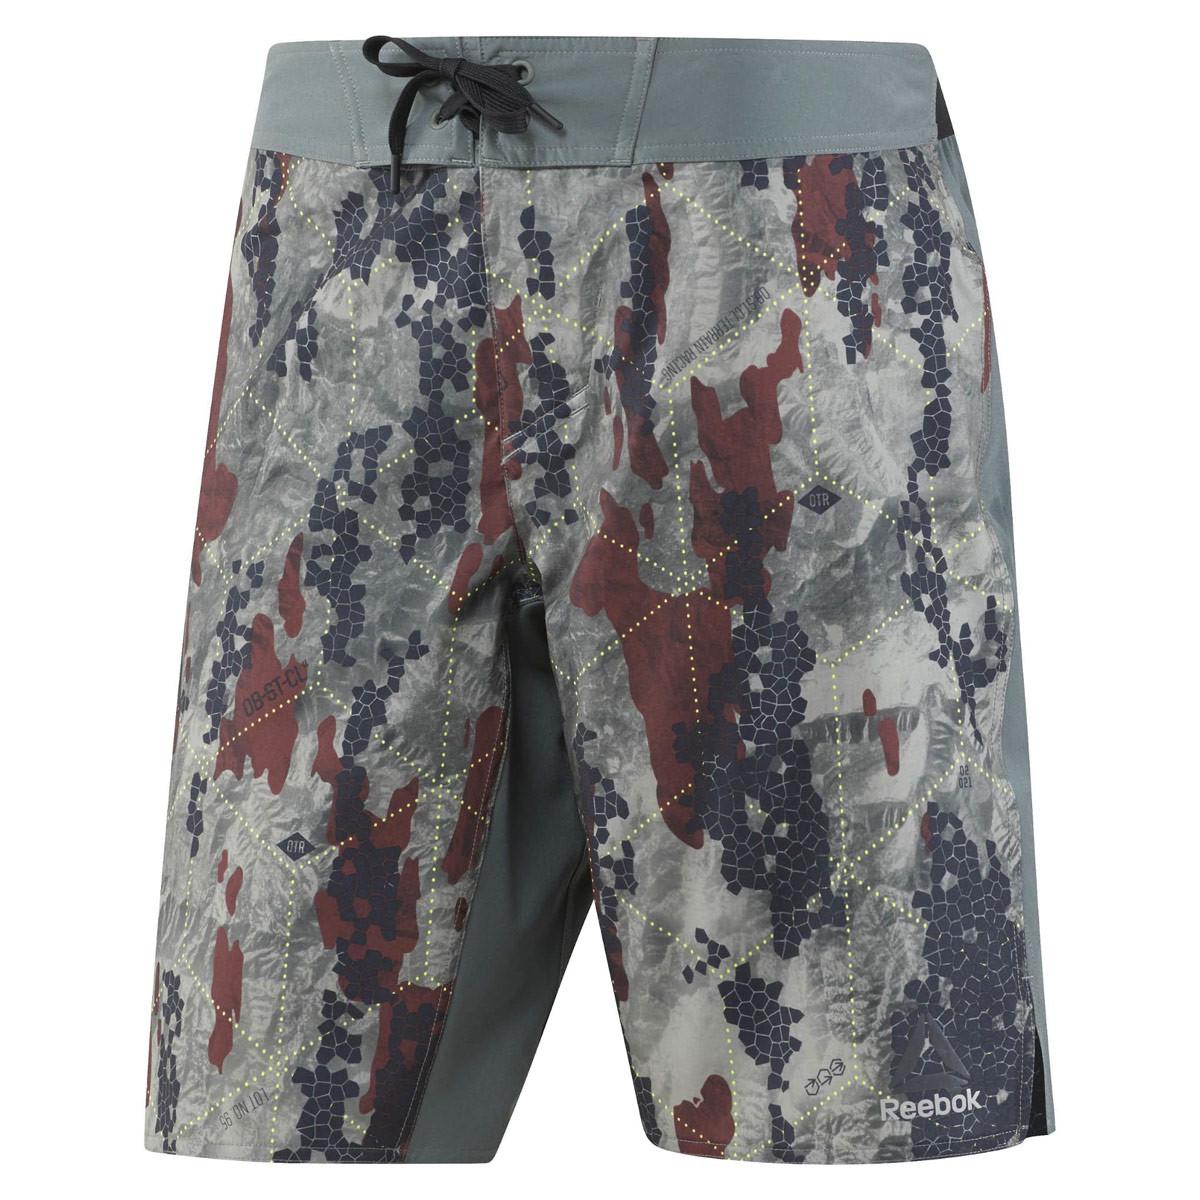 b2f7023e40 Reebok Spartan Race Board Short - Running trousers for Men - Grey | 21RUN